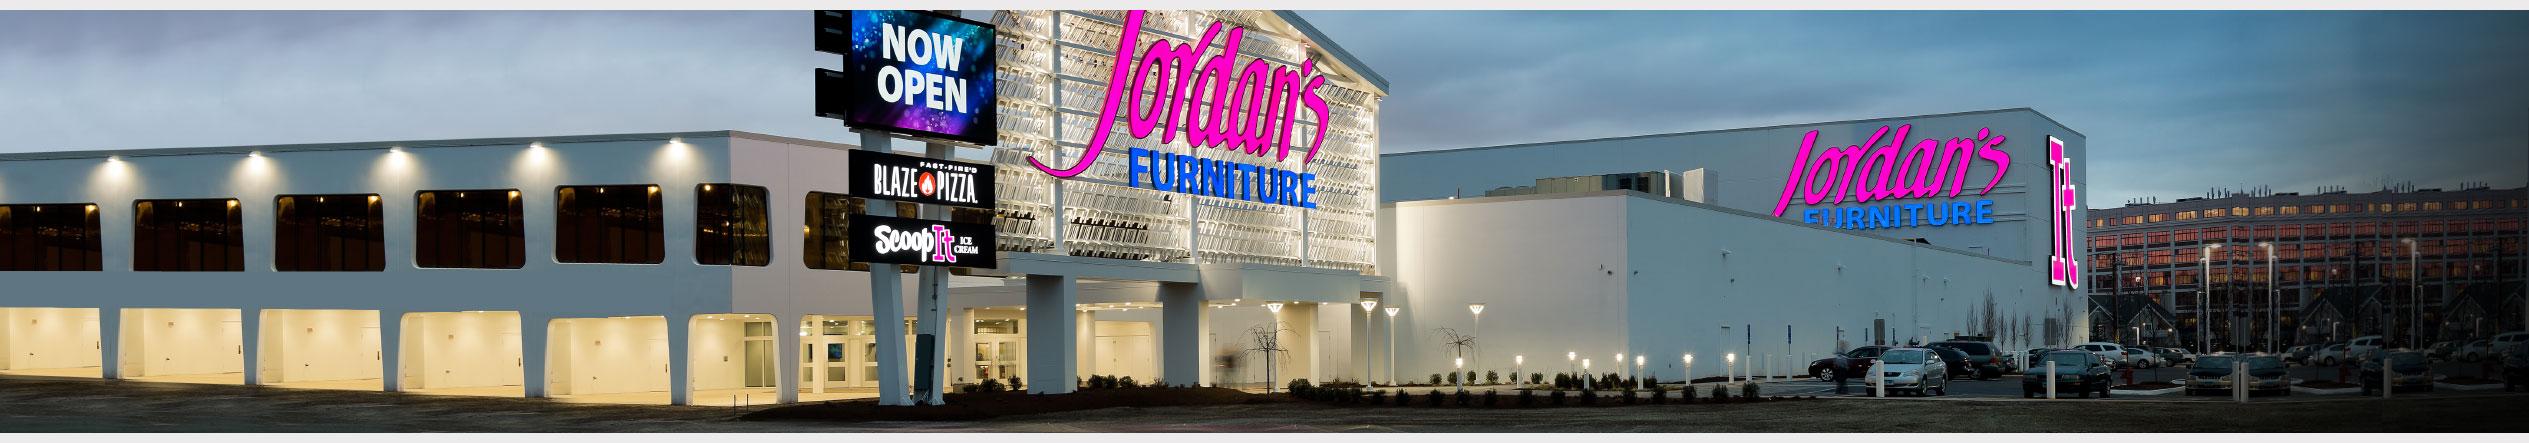 Jordan's Furniture in New Haven, CT